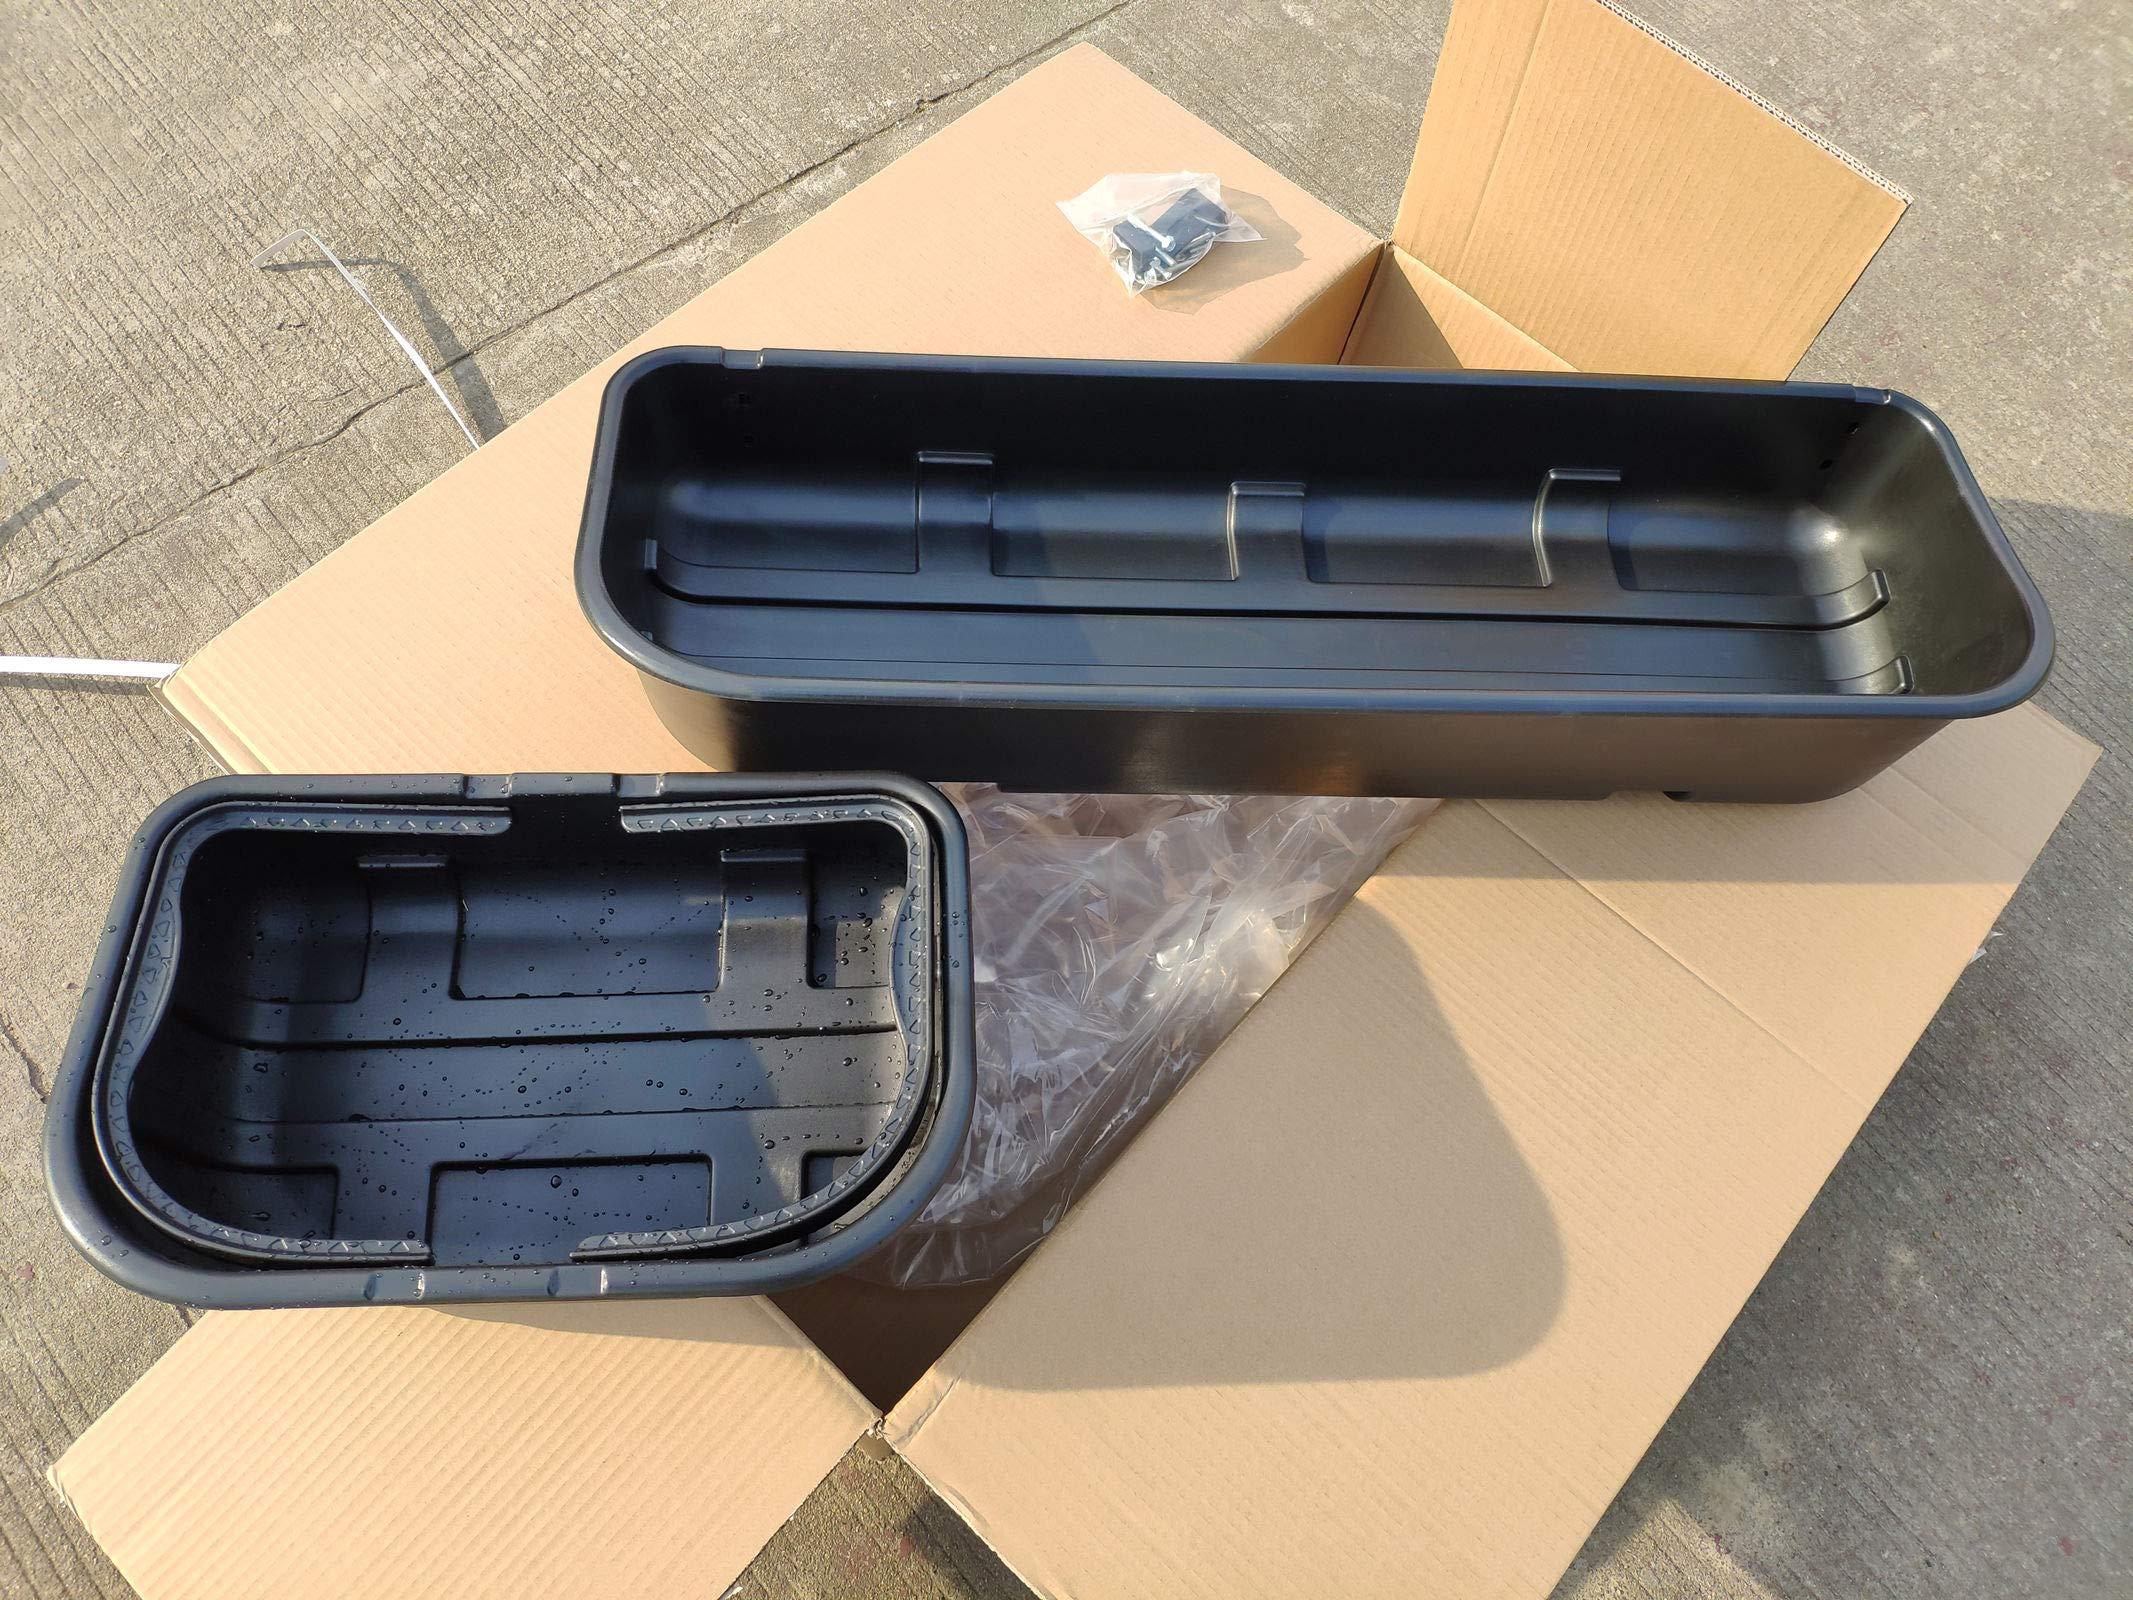 syppo Black Underseat Storage Box Detachable Style (for 2015-2019 Ford F150 Super Crew Cab) by syppo